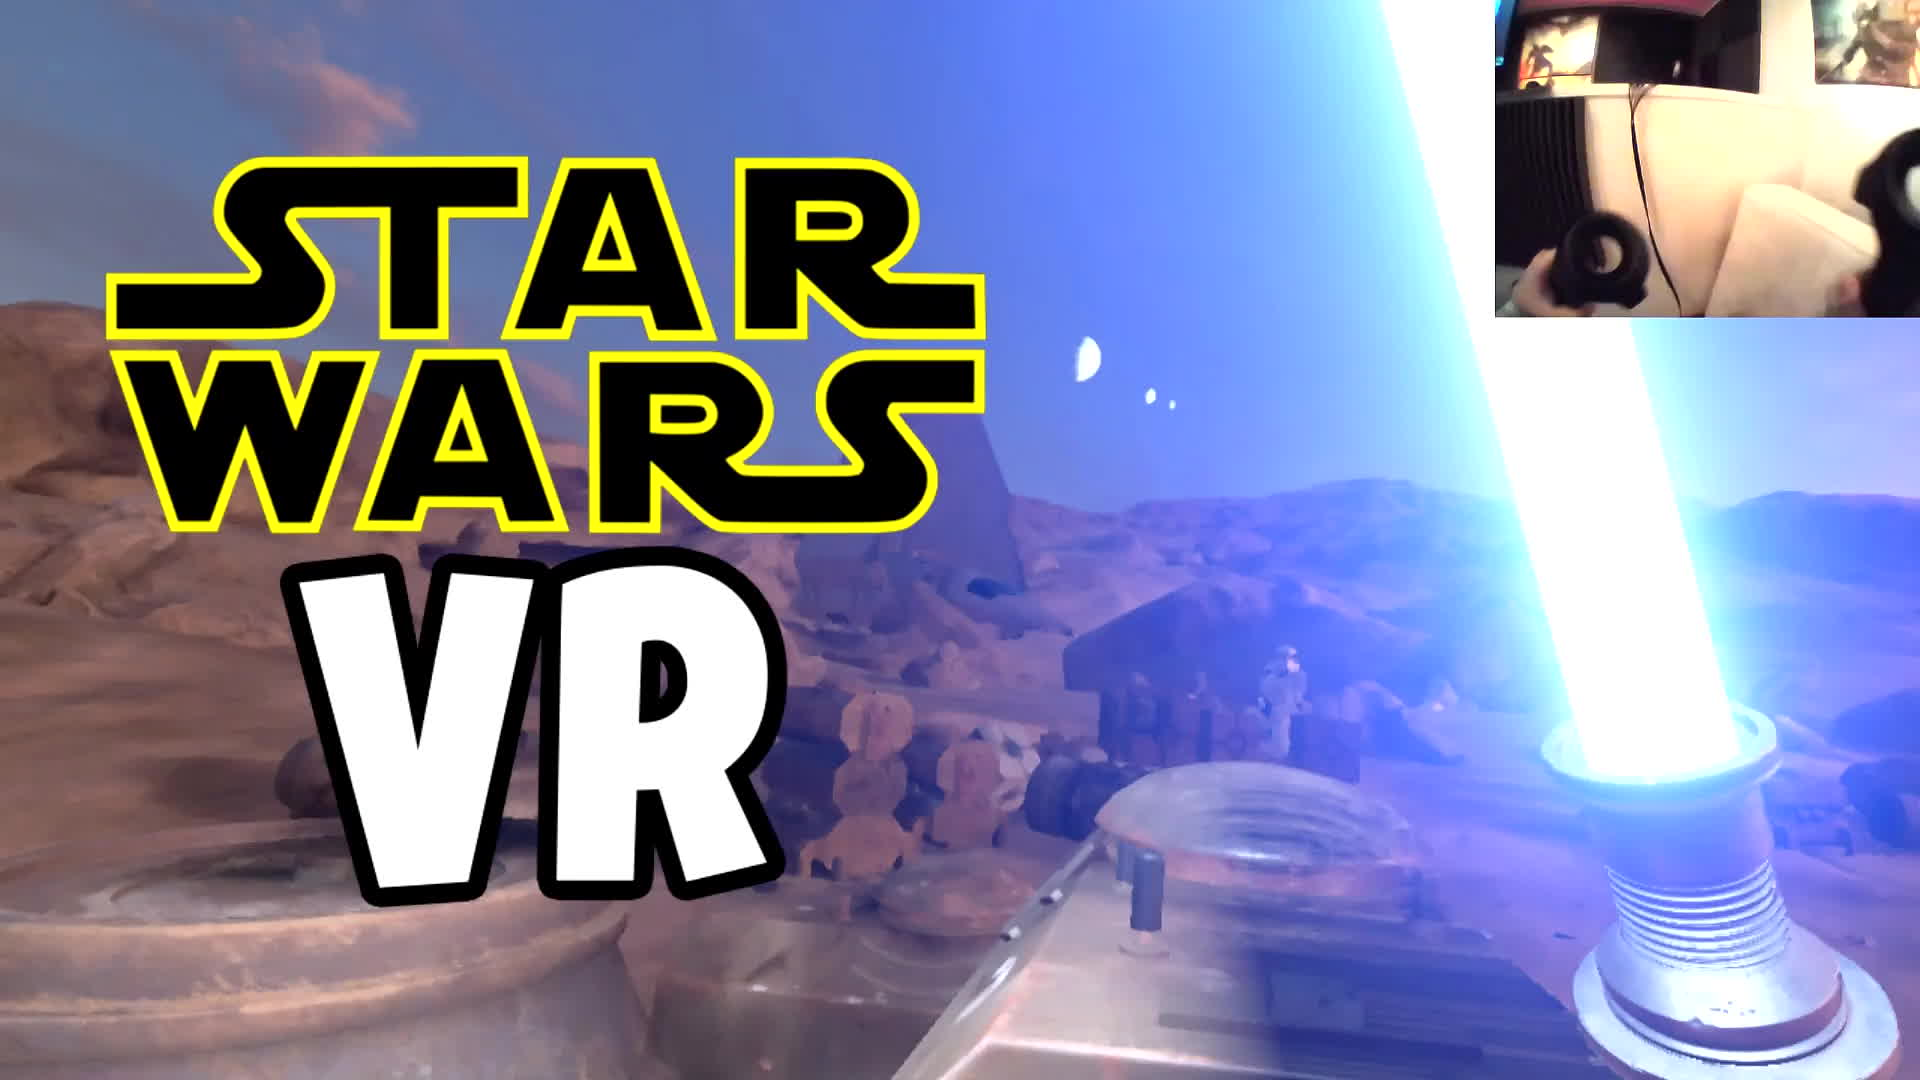 friends, gaming, Star Wars Lightsaber 60fps GIFs